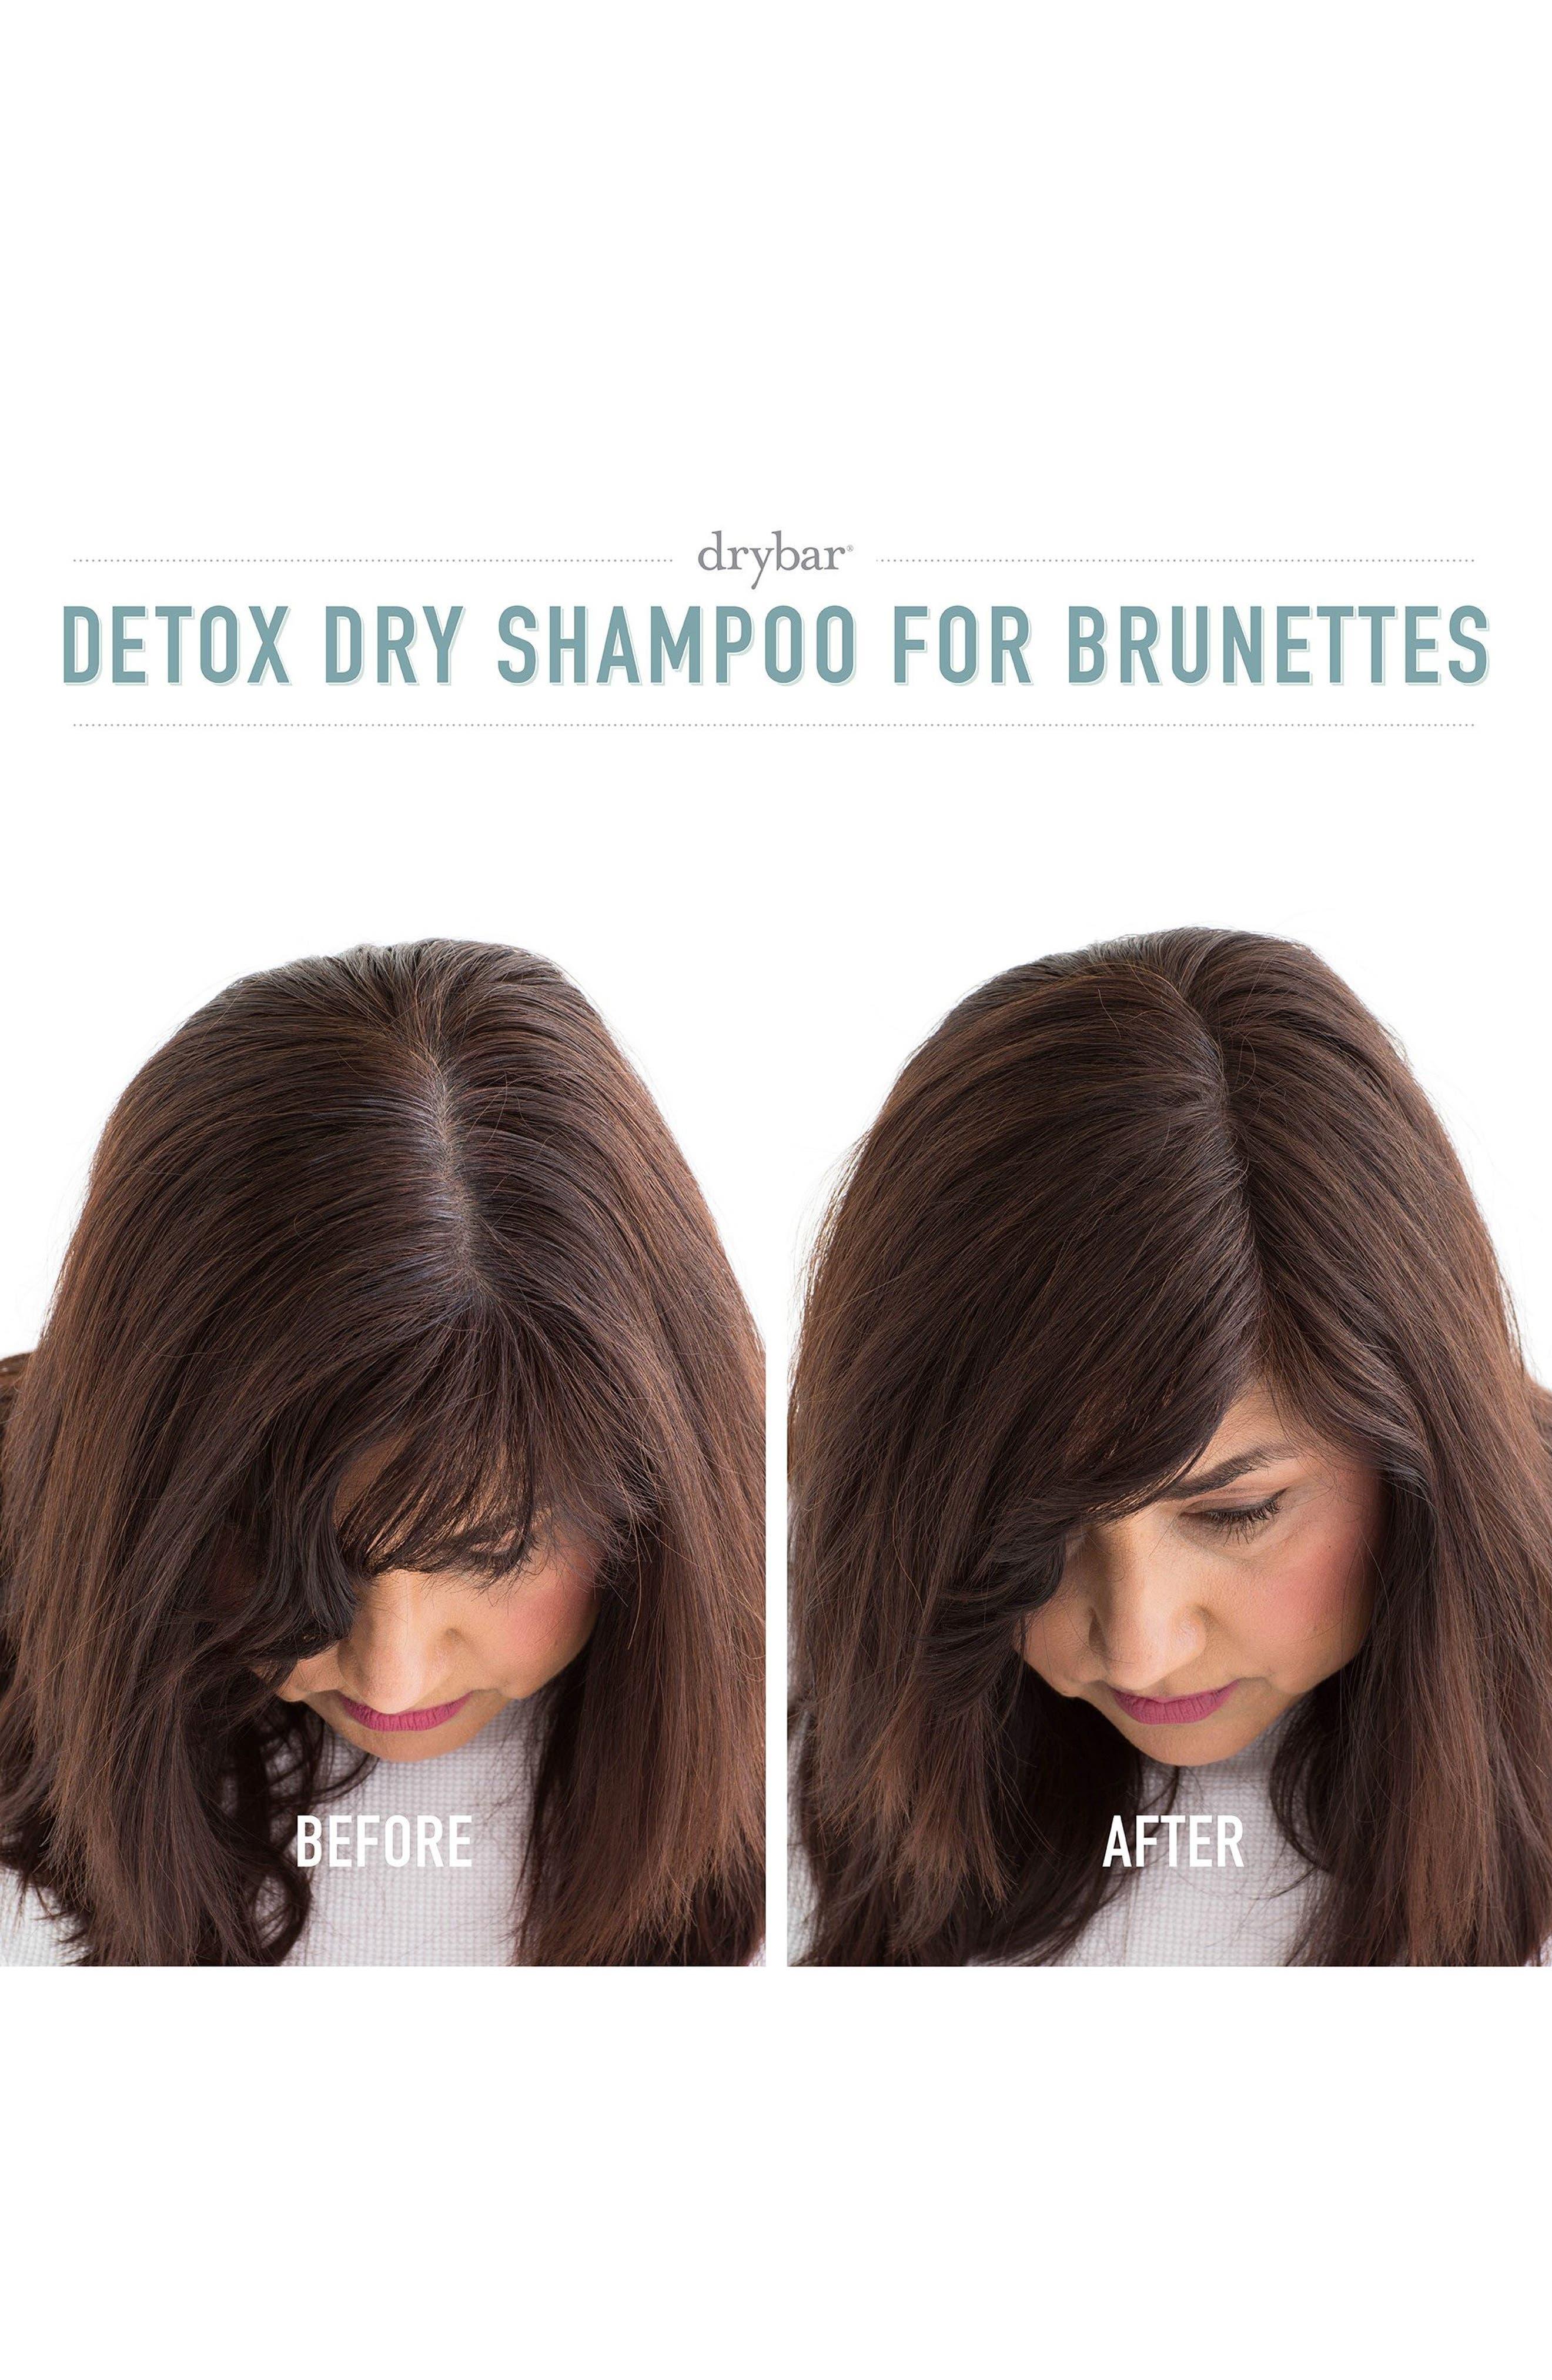 'Detox' Dry Shampoo for Brunettes,                             Alternate thumbnail 2, color,                             No Color